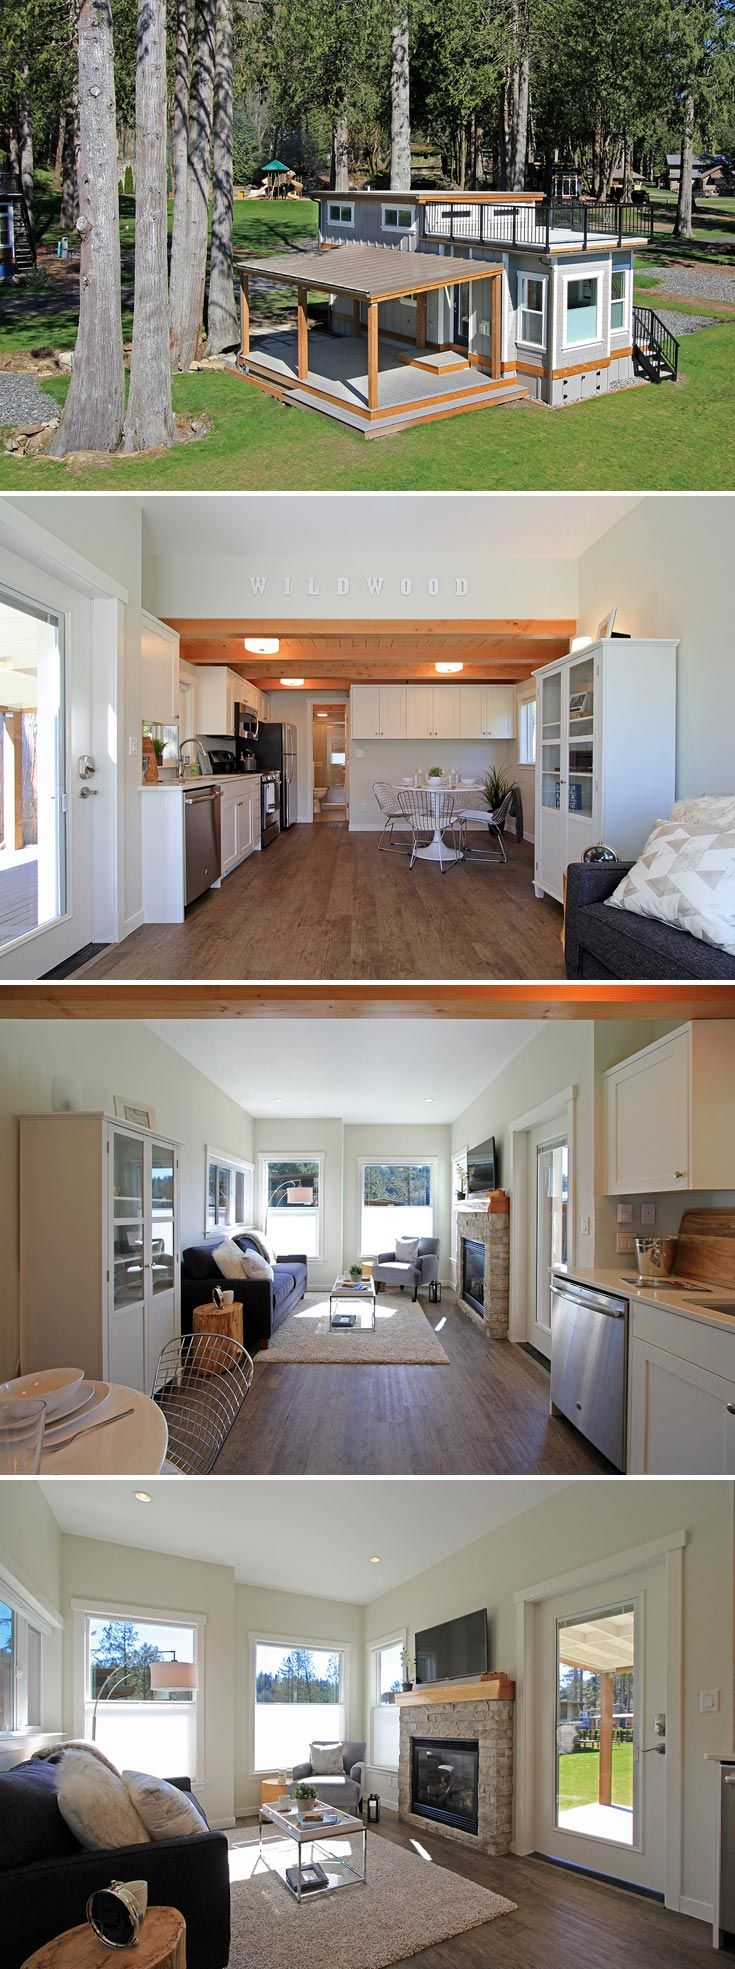 25 best ideas about park homes on pinterest park model for 8x8 room design